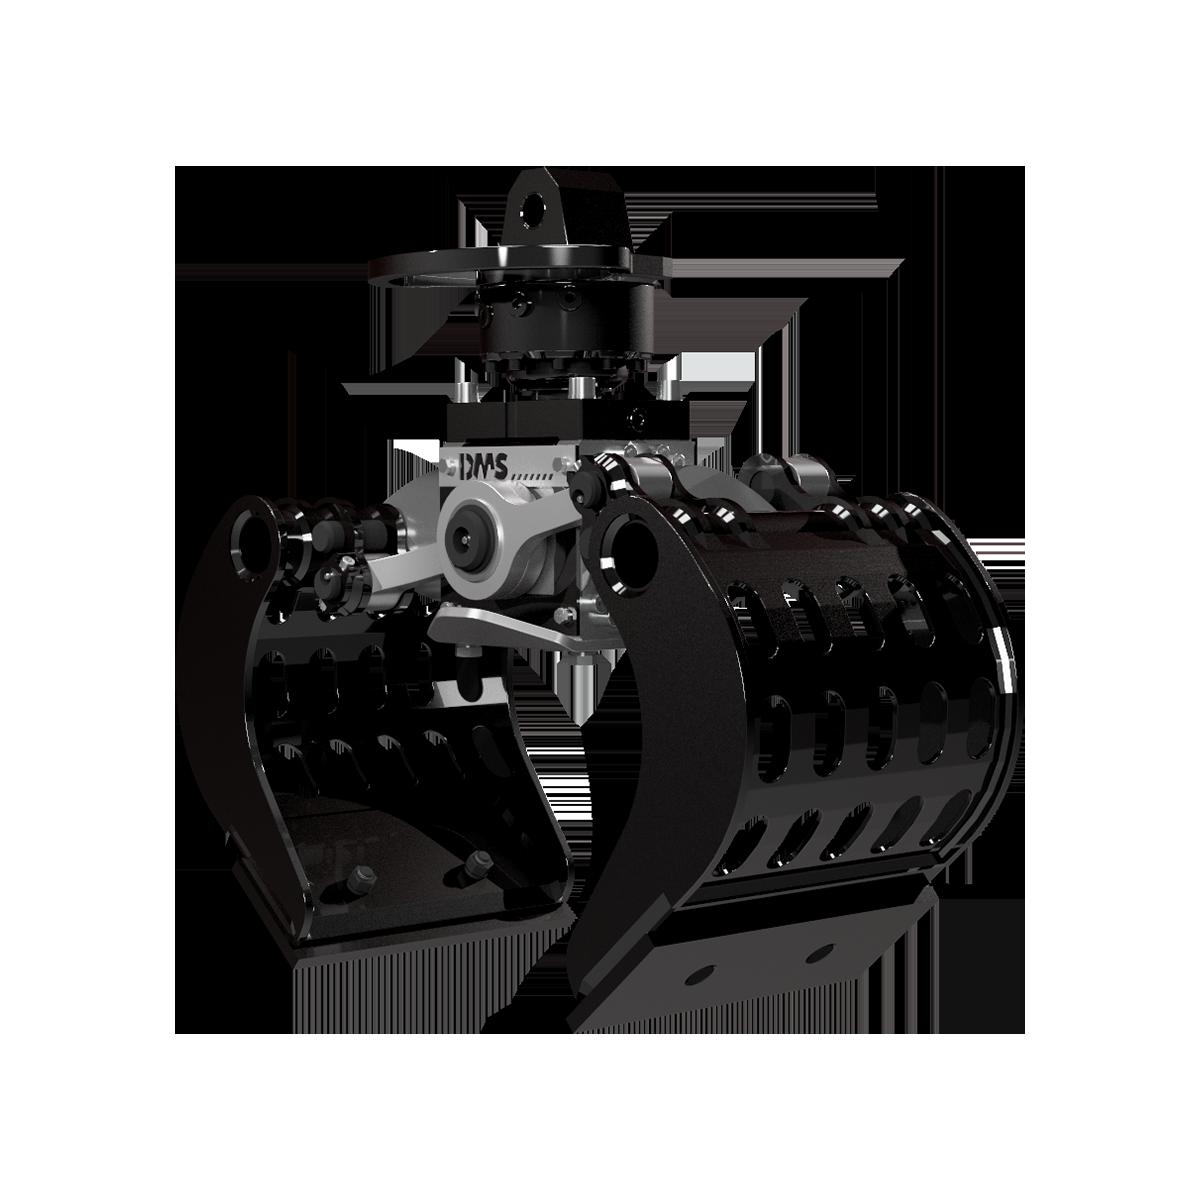 Ladekran Abbruchgreifer AG3535p von DMS Technologie